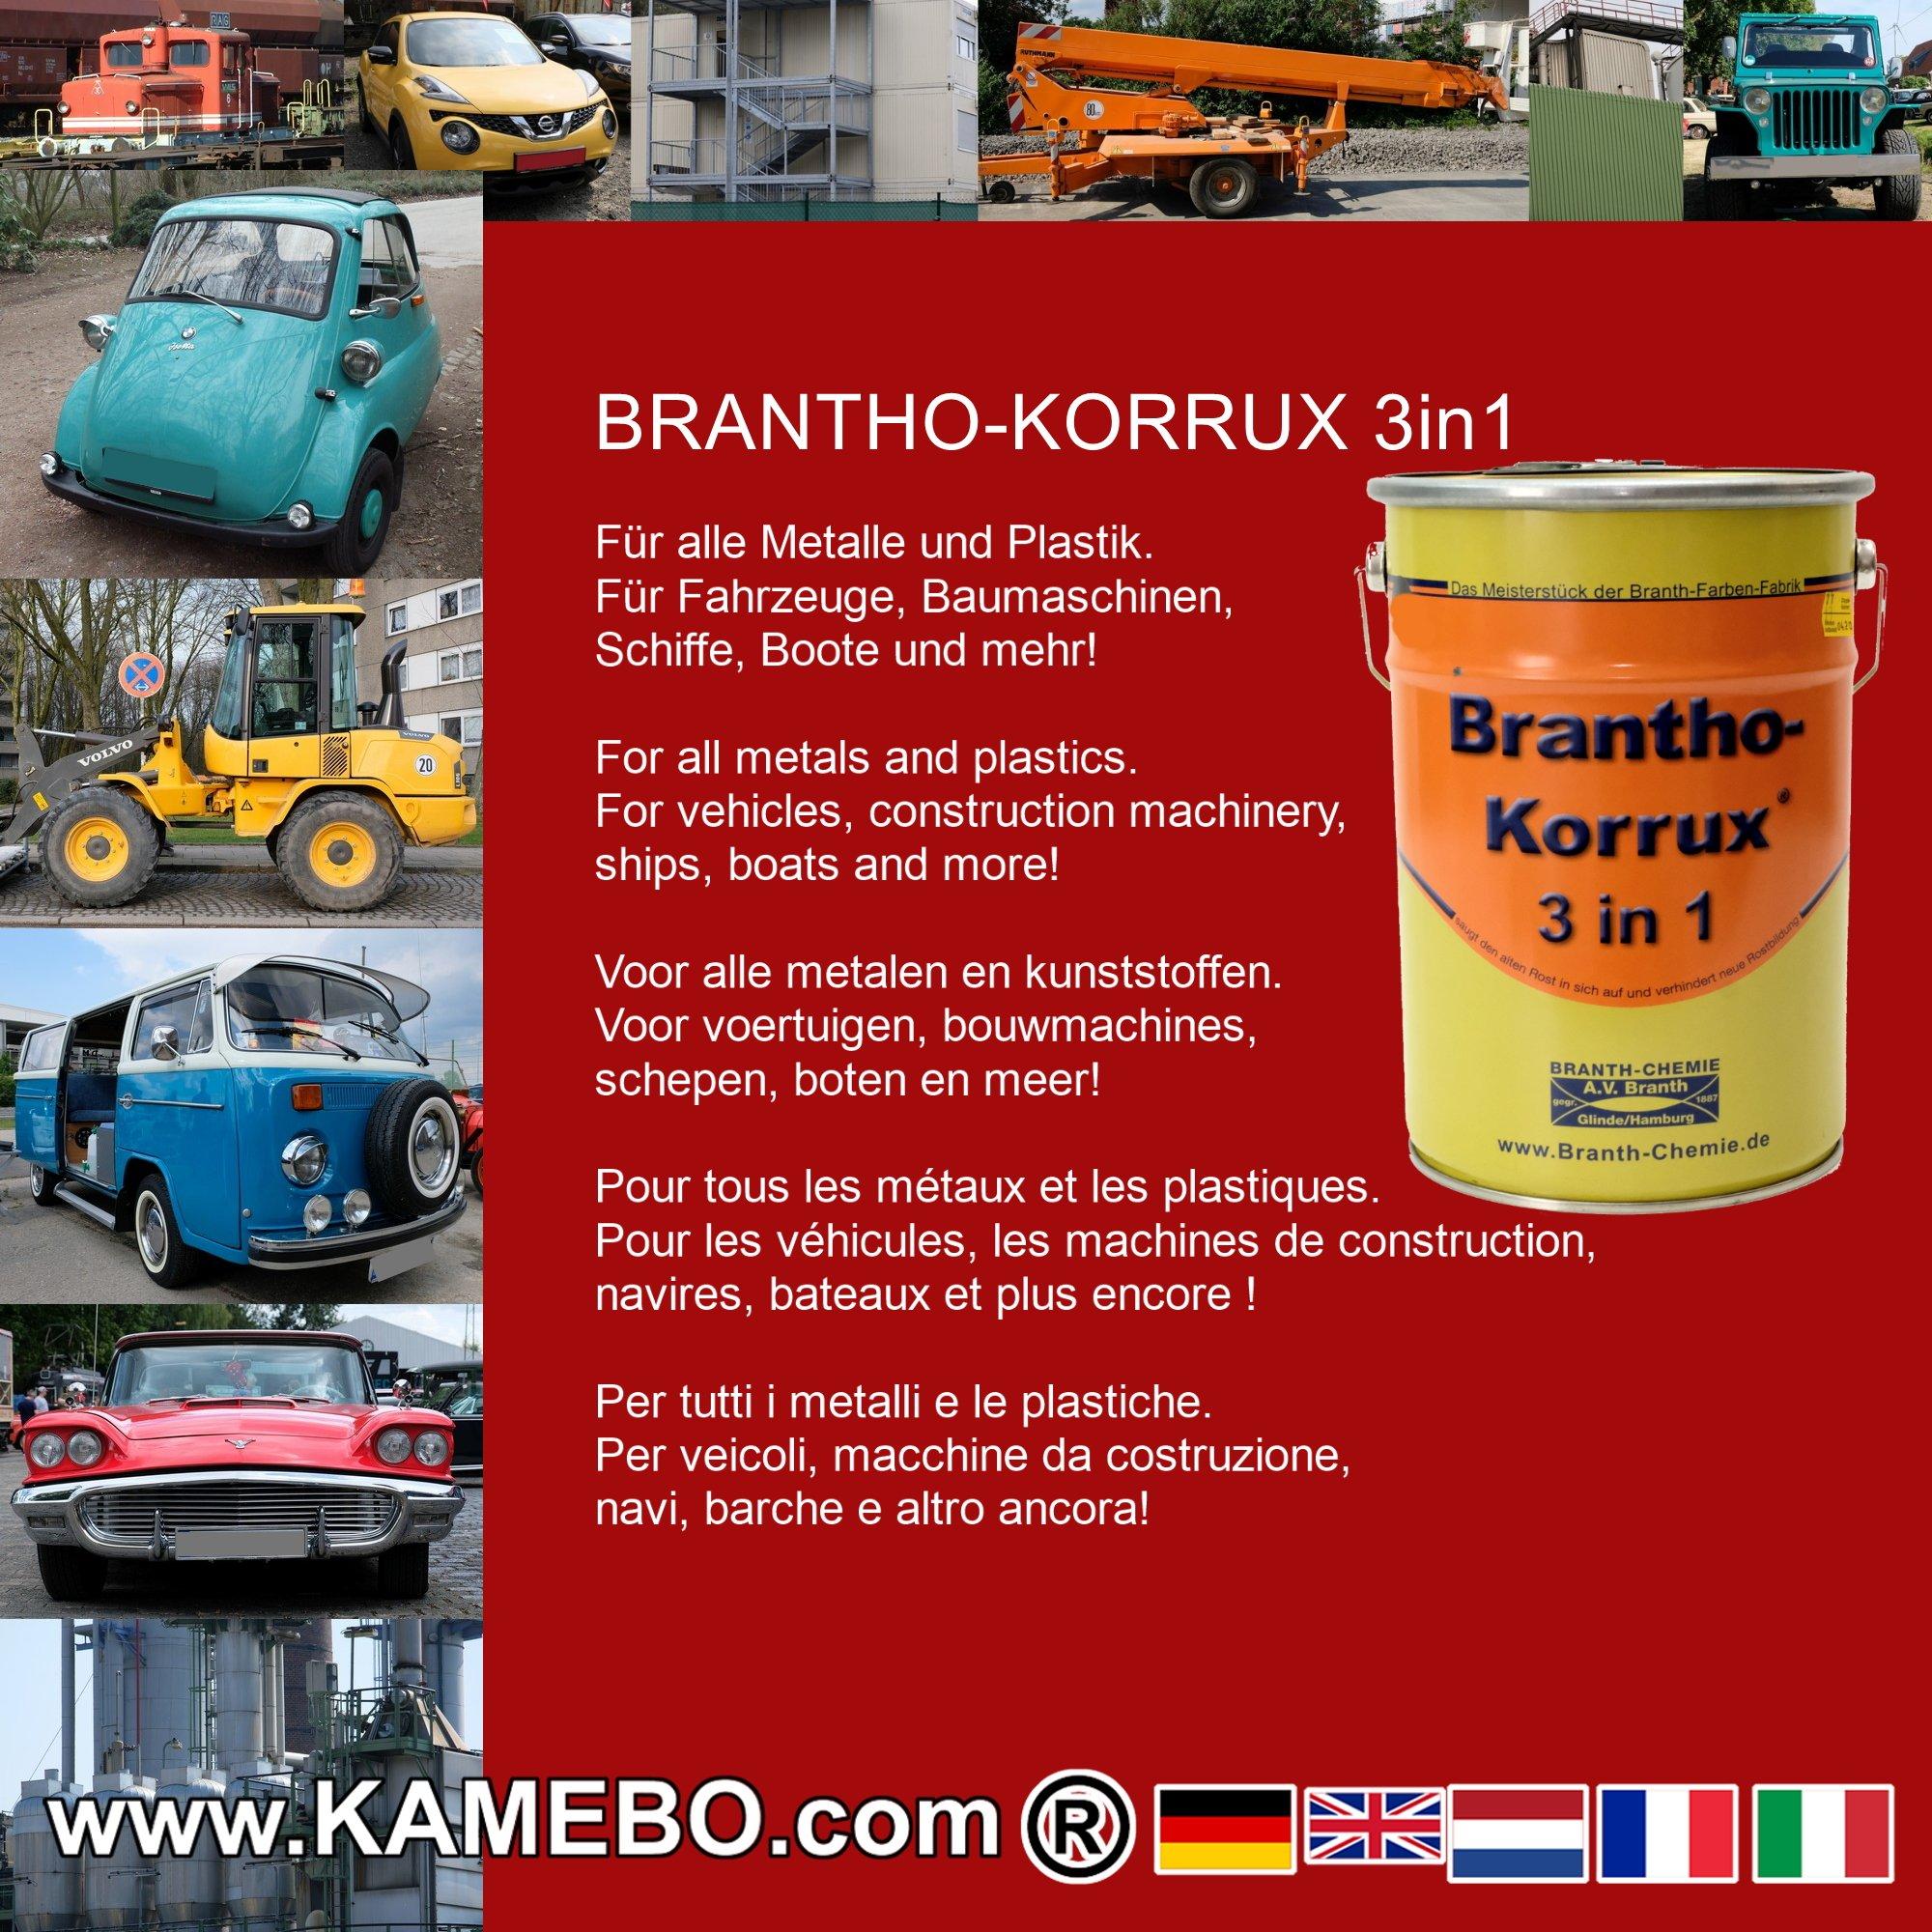 brantho korrux 3 in 1 rostschutzfarbe f r metall ral 3003 rubinrot 5 liter. Black Bedroom Furniture Sets. Home Design Ideas